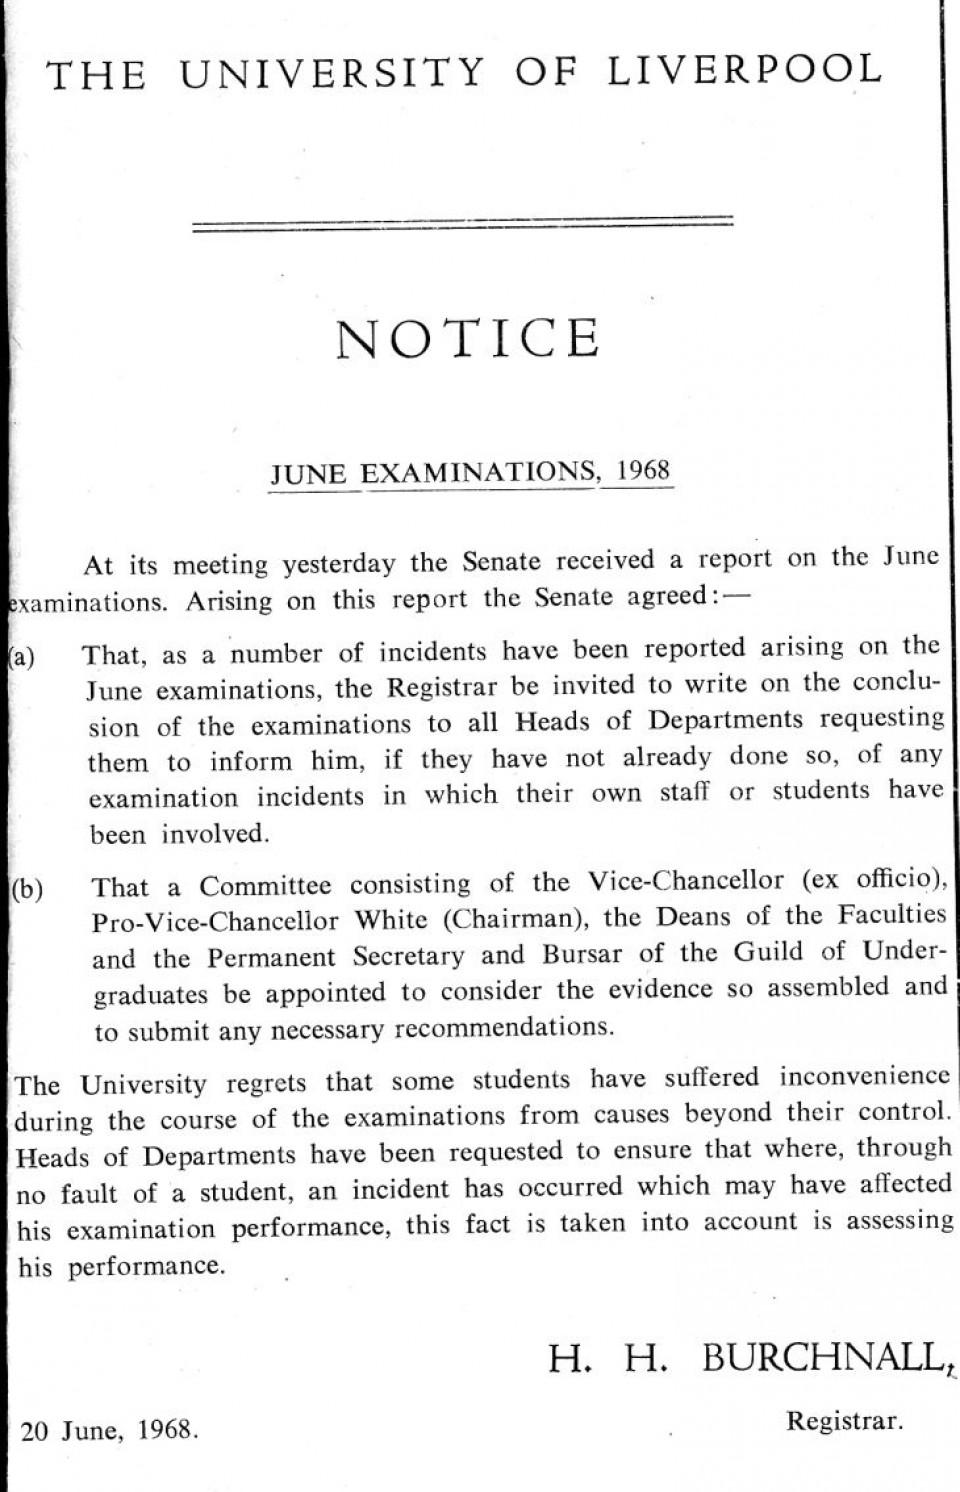 001 Essay Example Examination Should Abolished Surprising Be Public At School Level Not 960